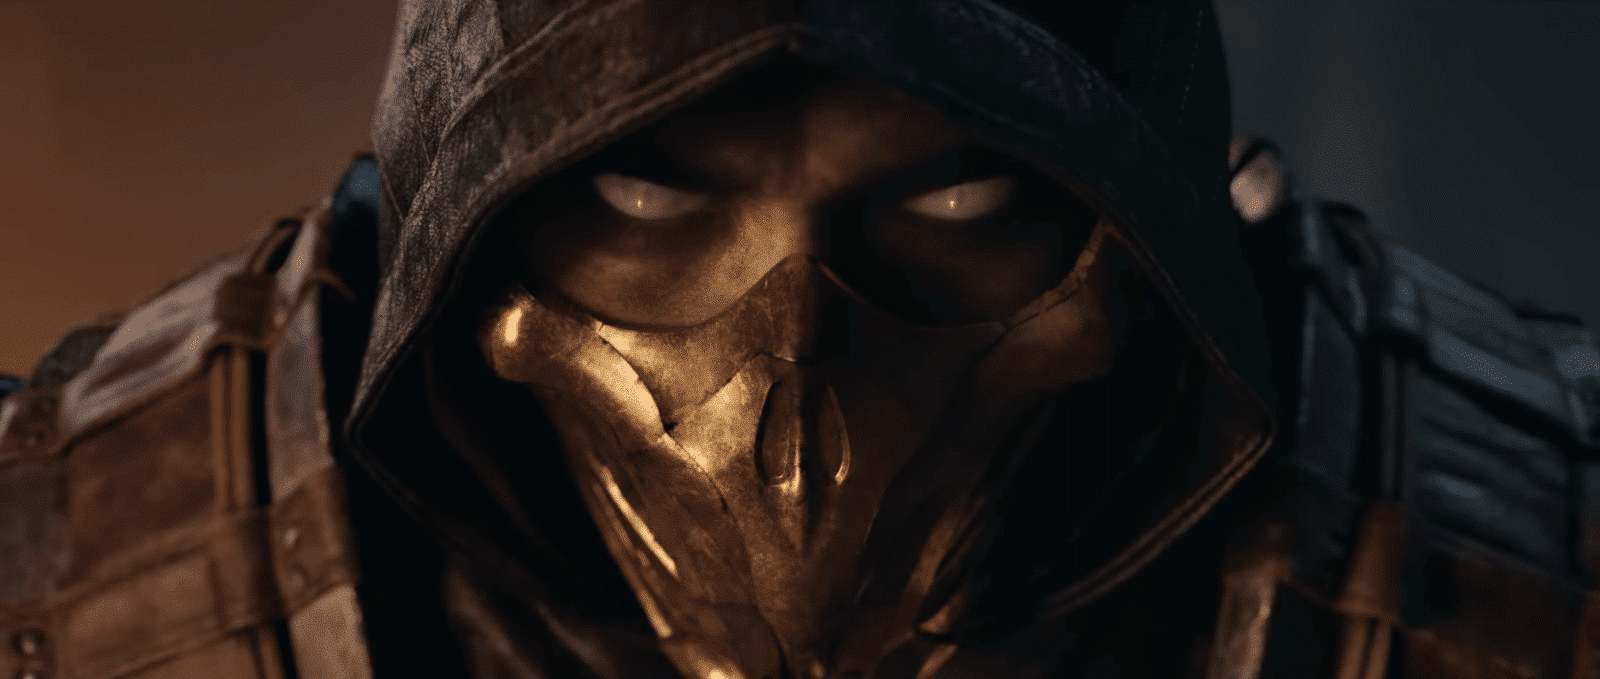 Mortal Kombat Movie release date; January 15 2021